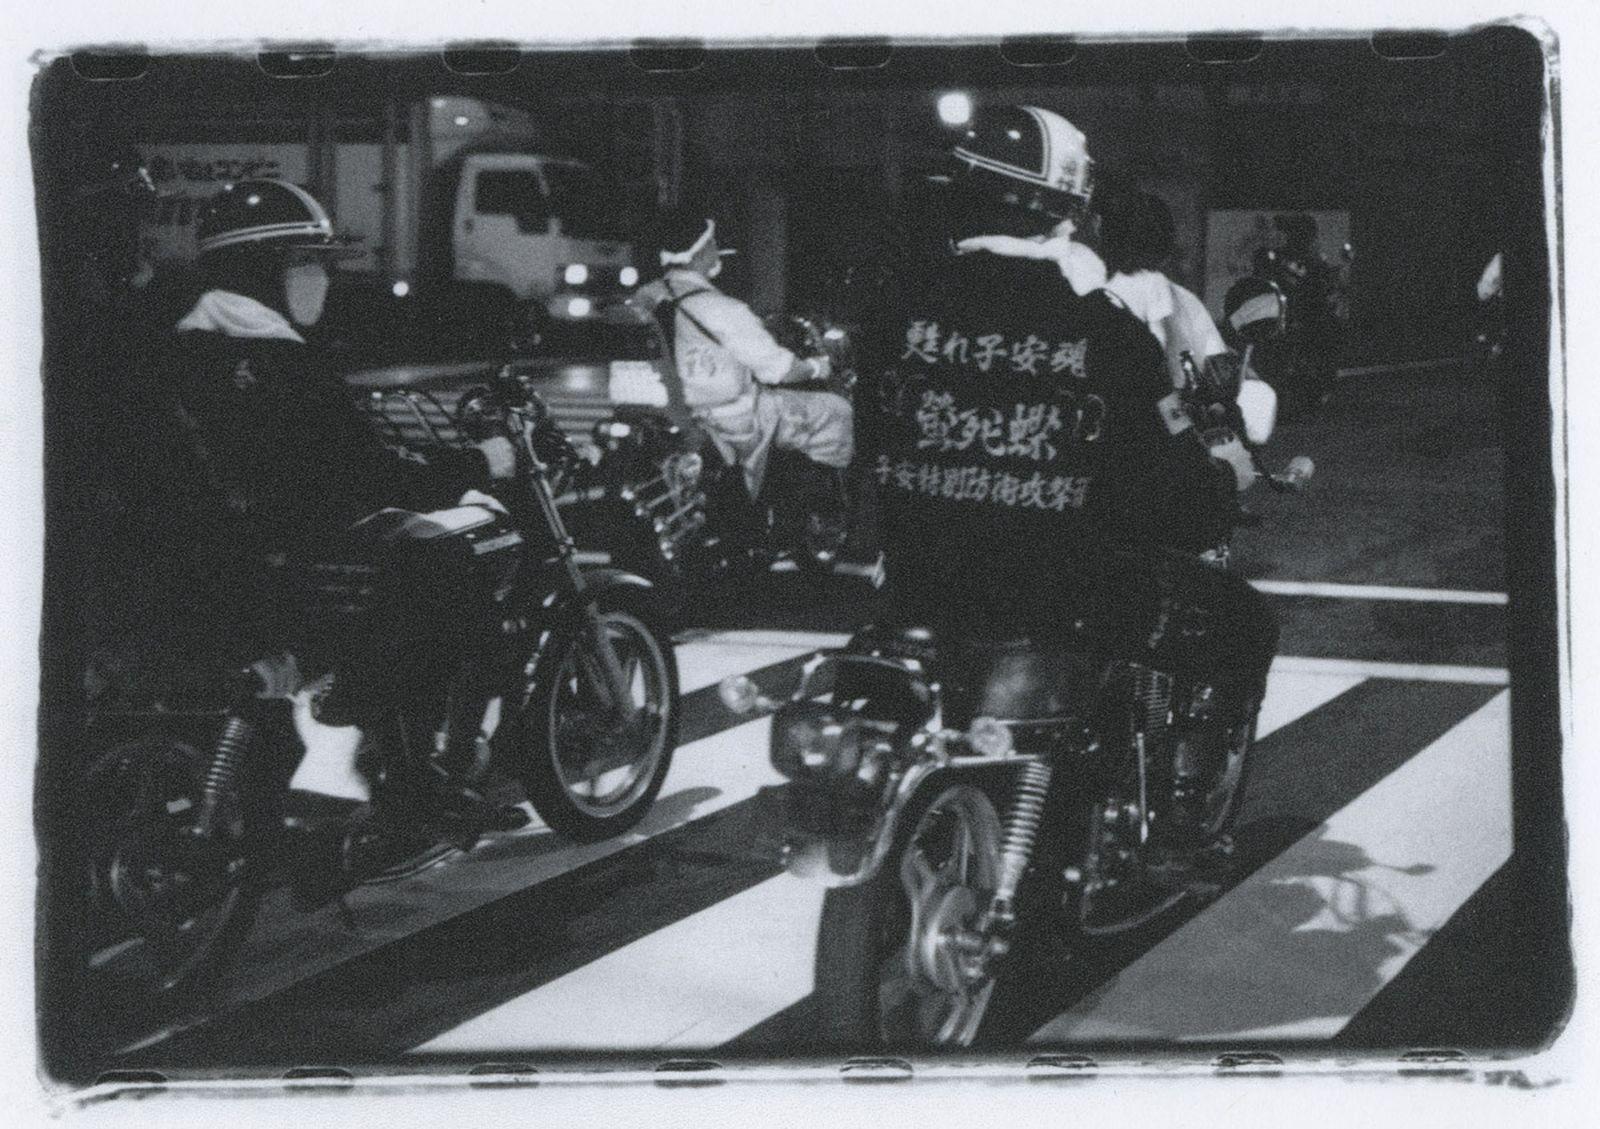 bosozoku-the-stylish-legacy-of-japans-rebel-motorcycle-gangs-10